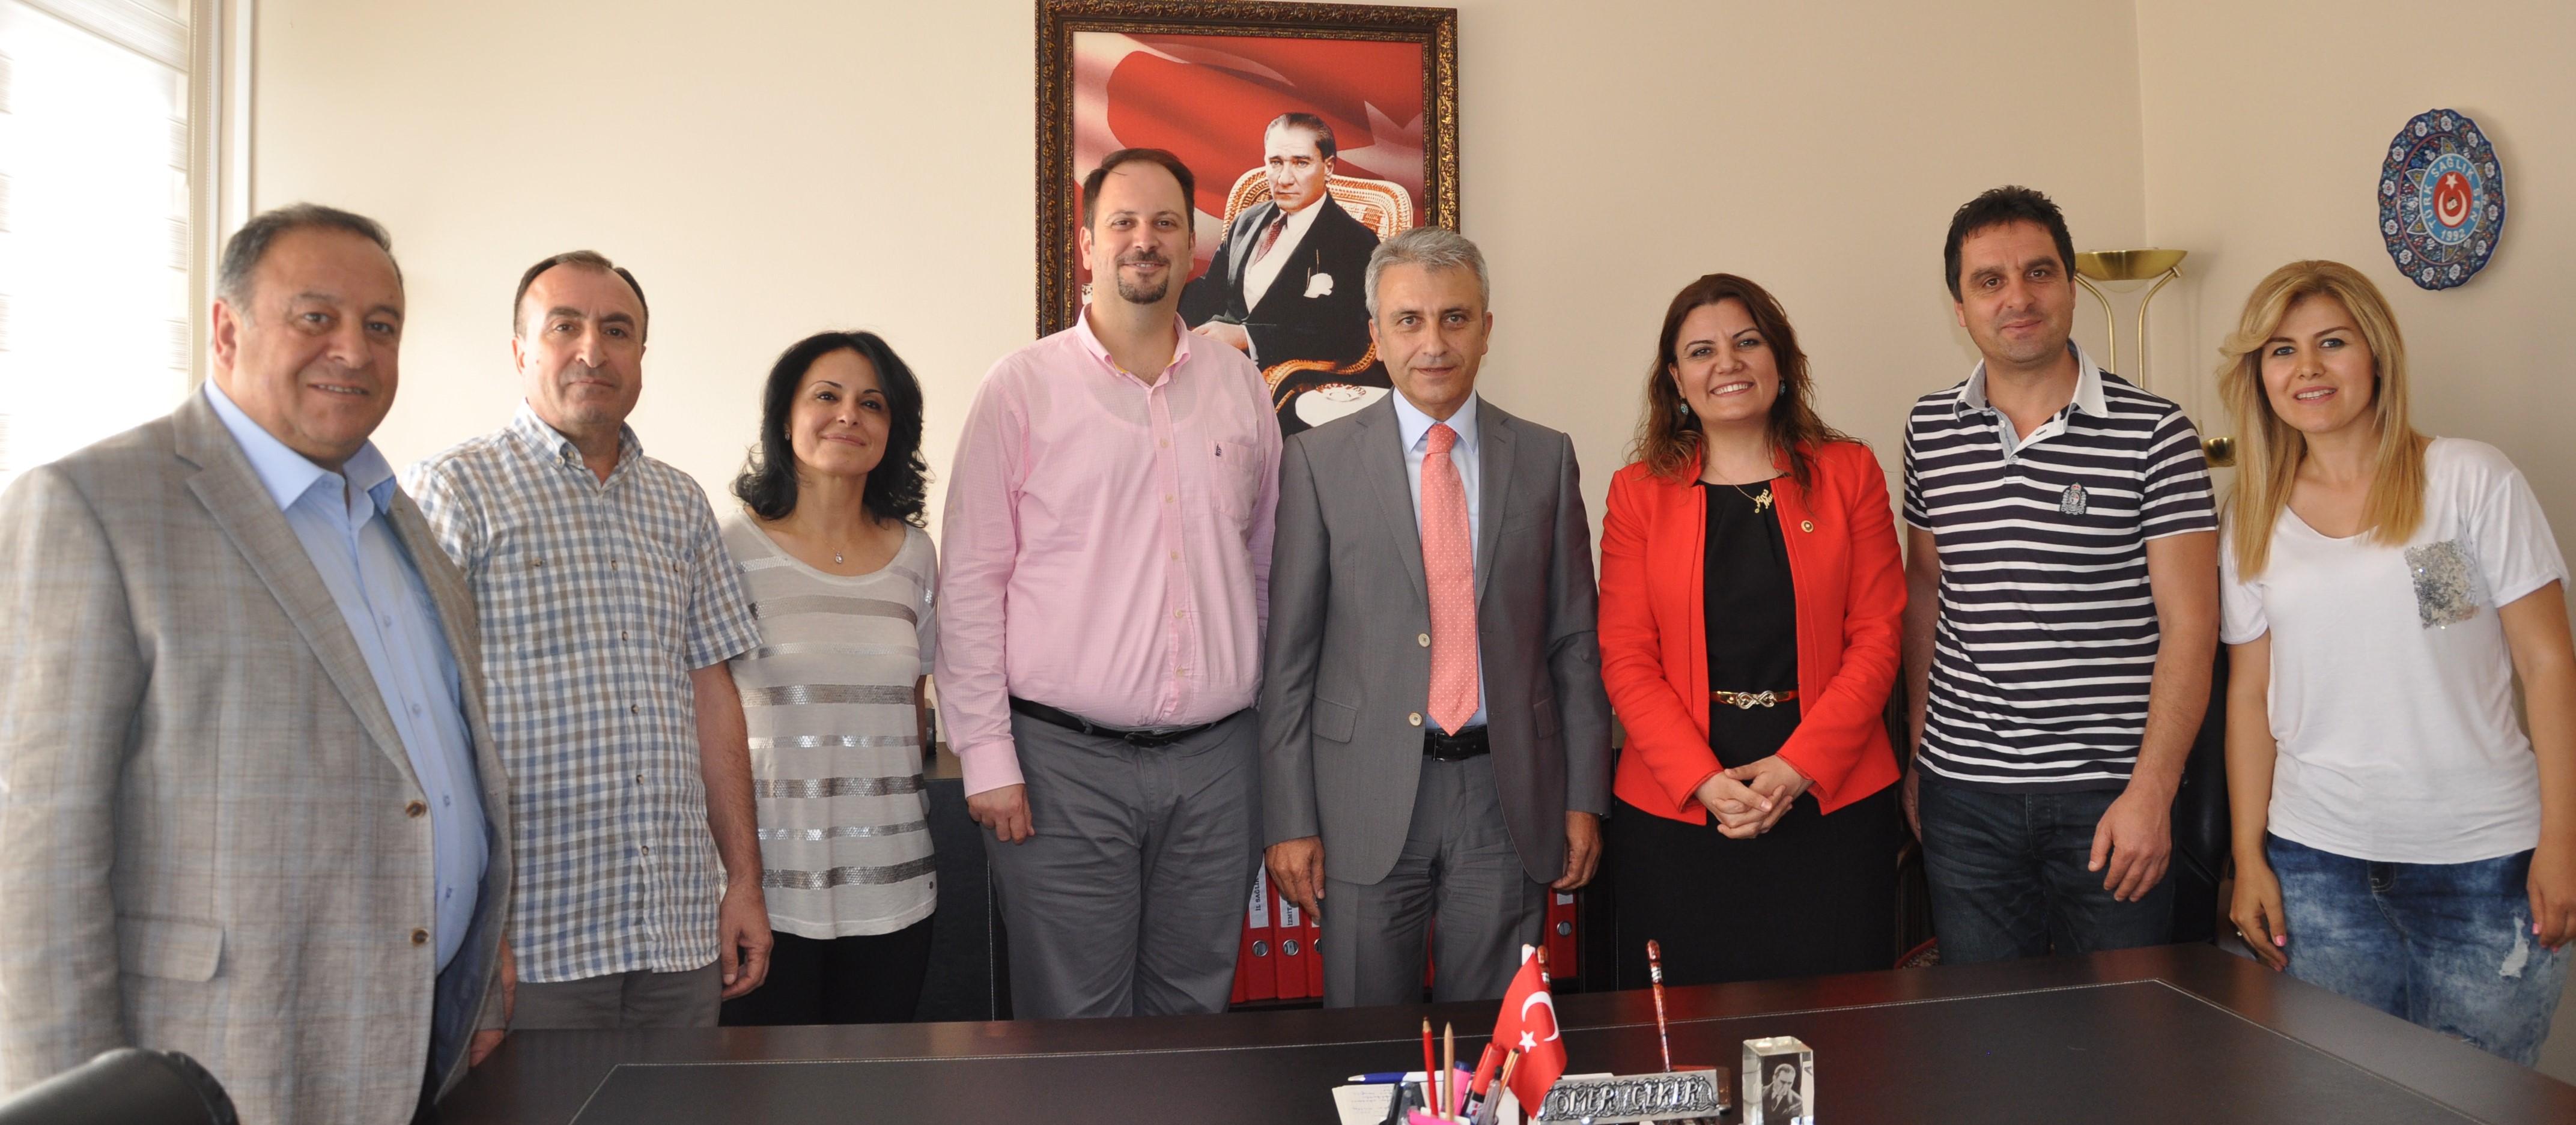 Milletvekili Hürriyet'ten Sendikamıza Ziyaret